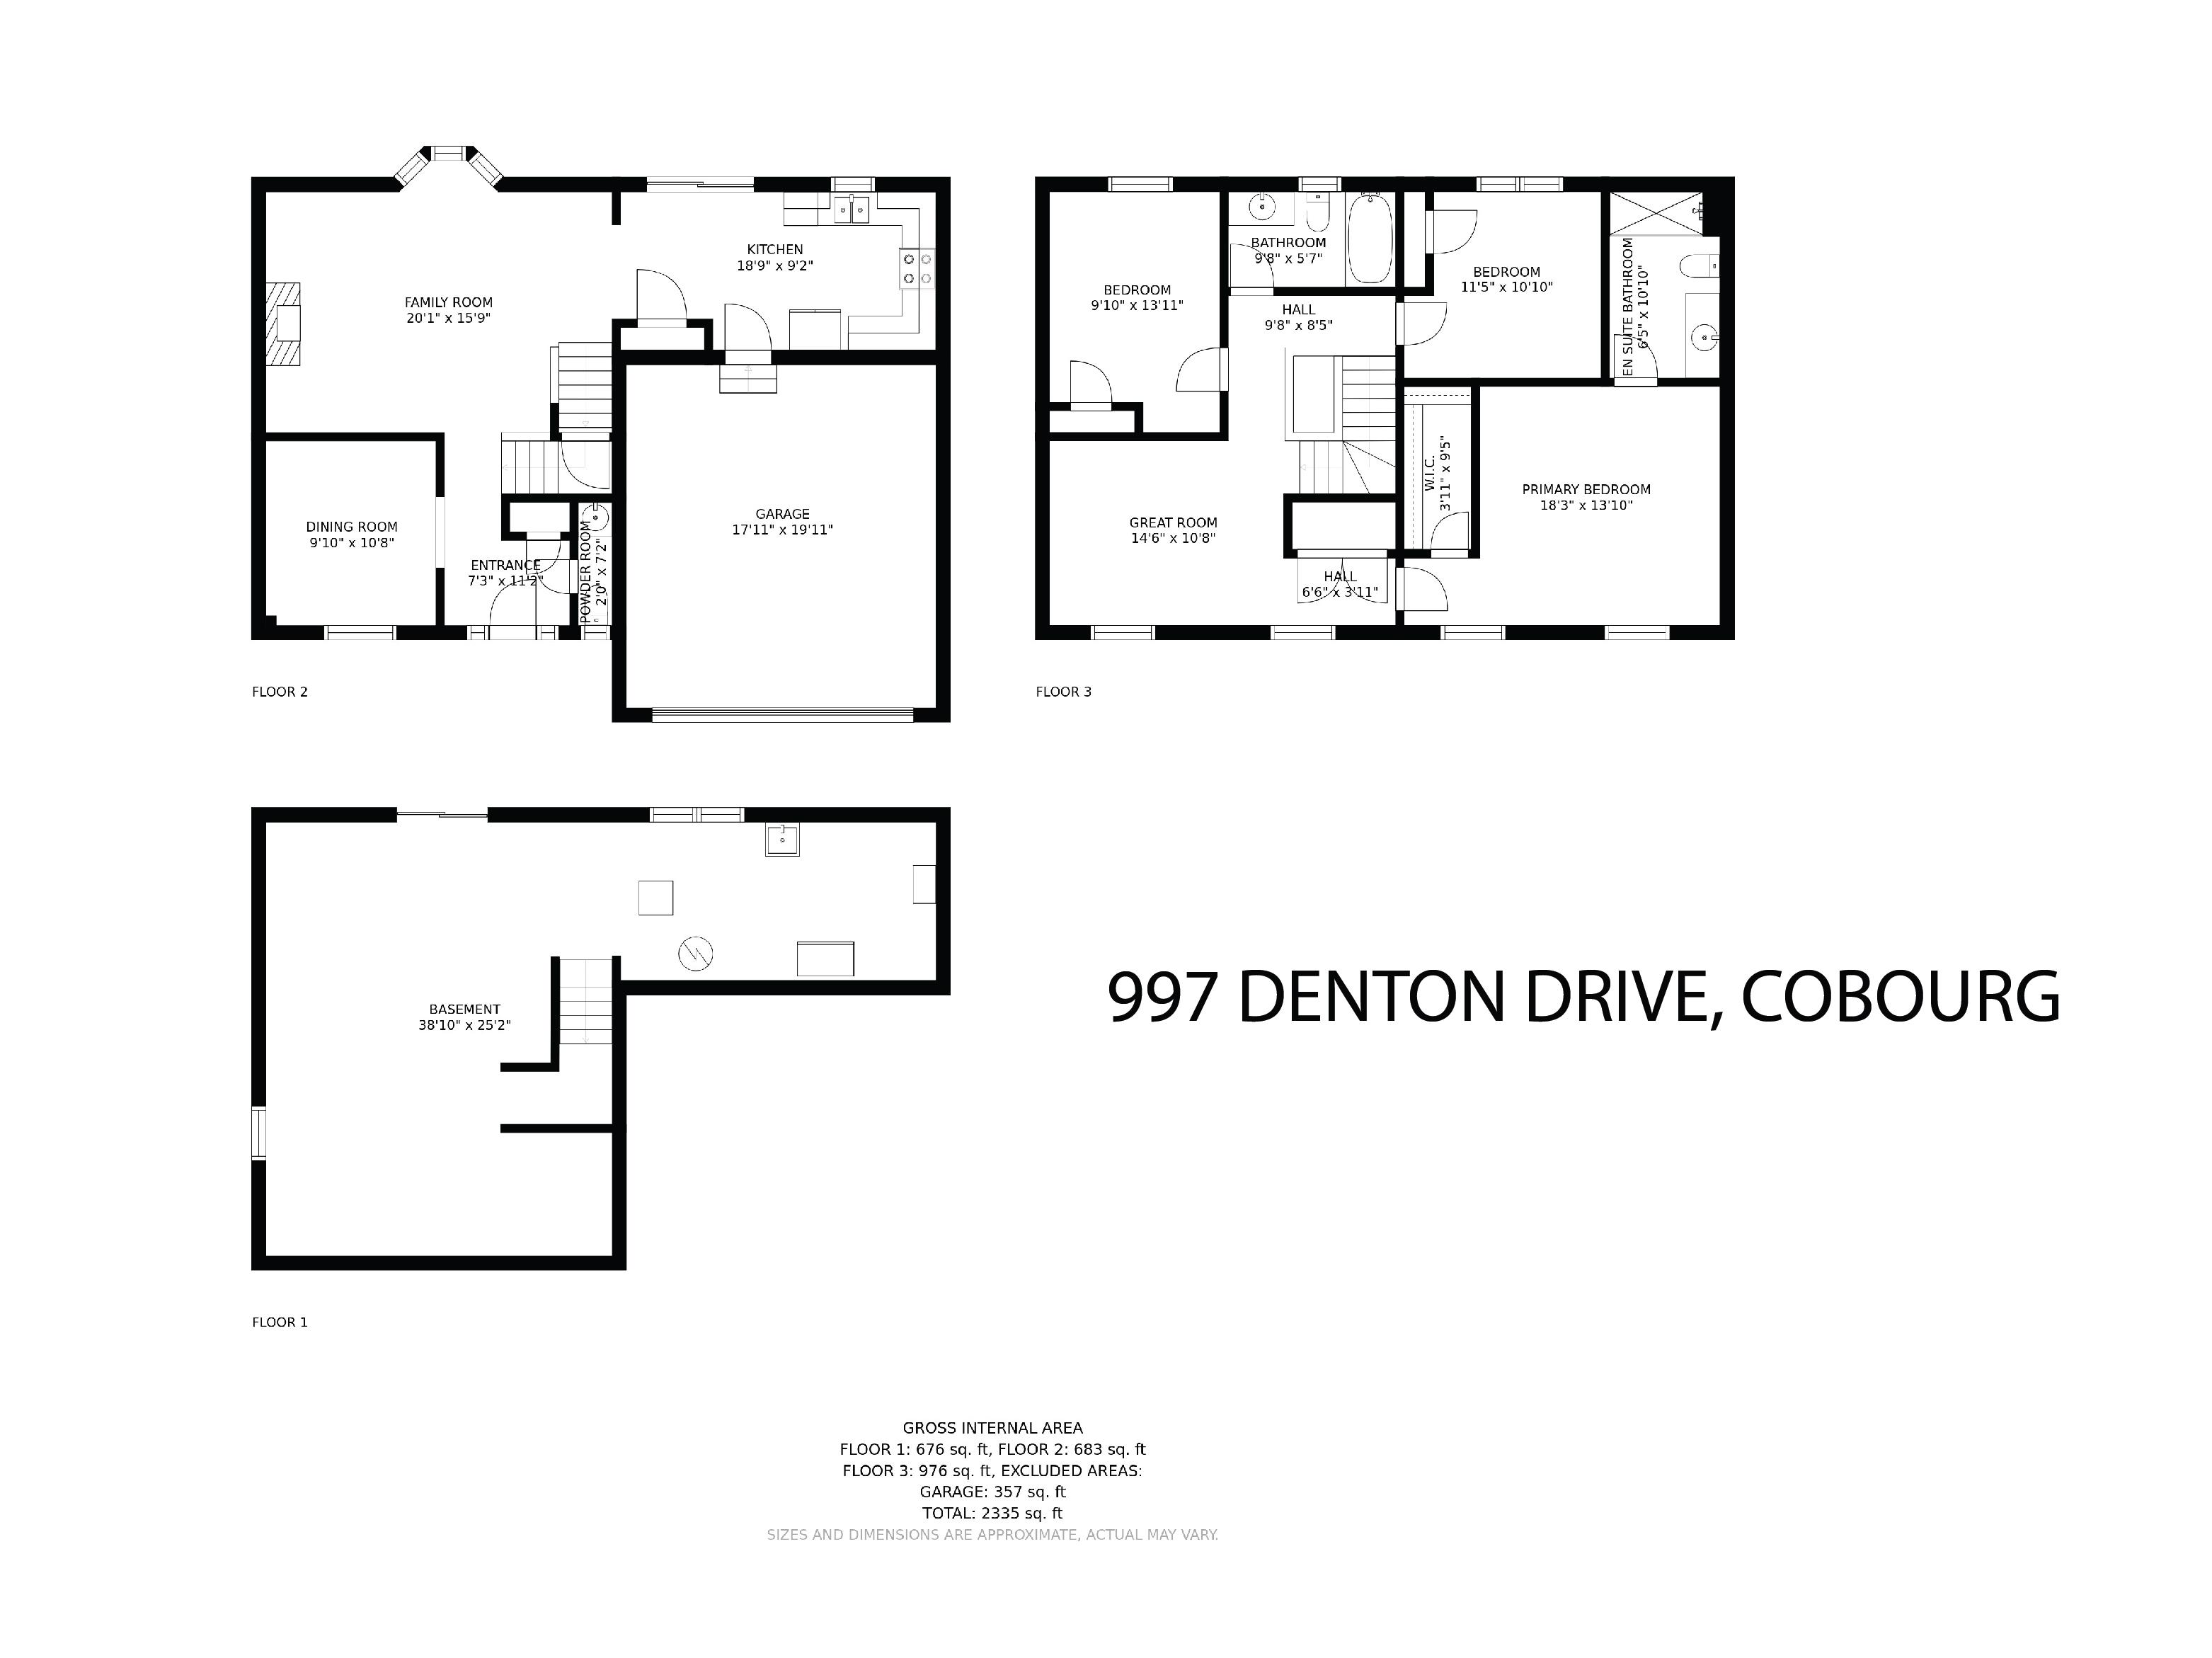 997 Denton Drive floorplan